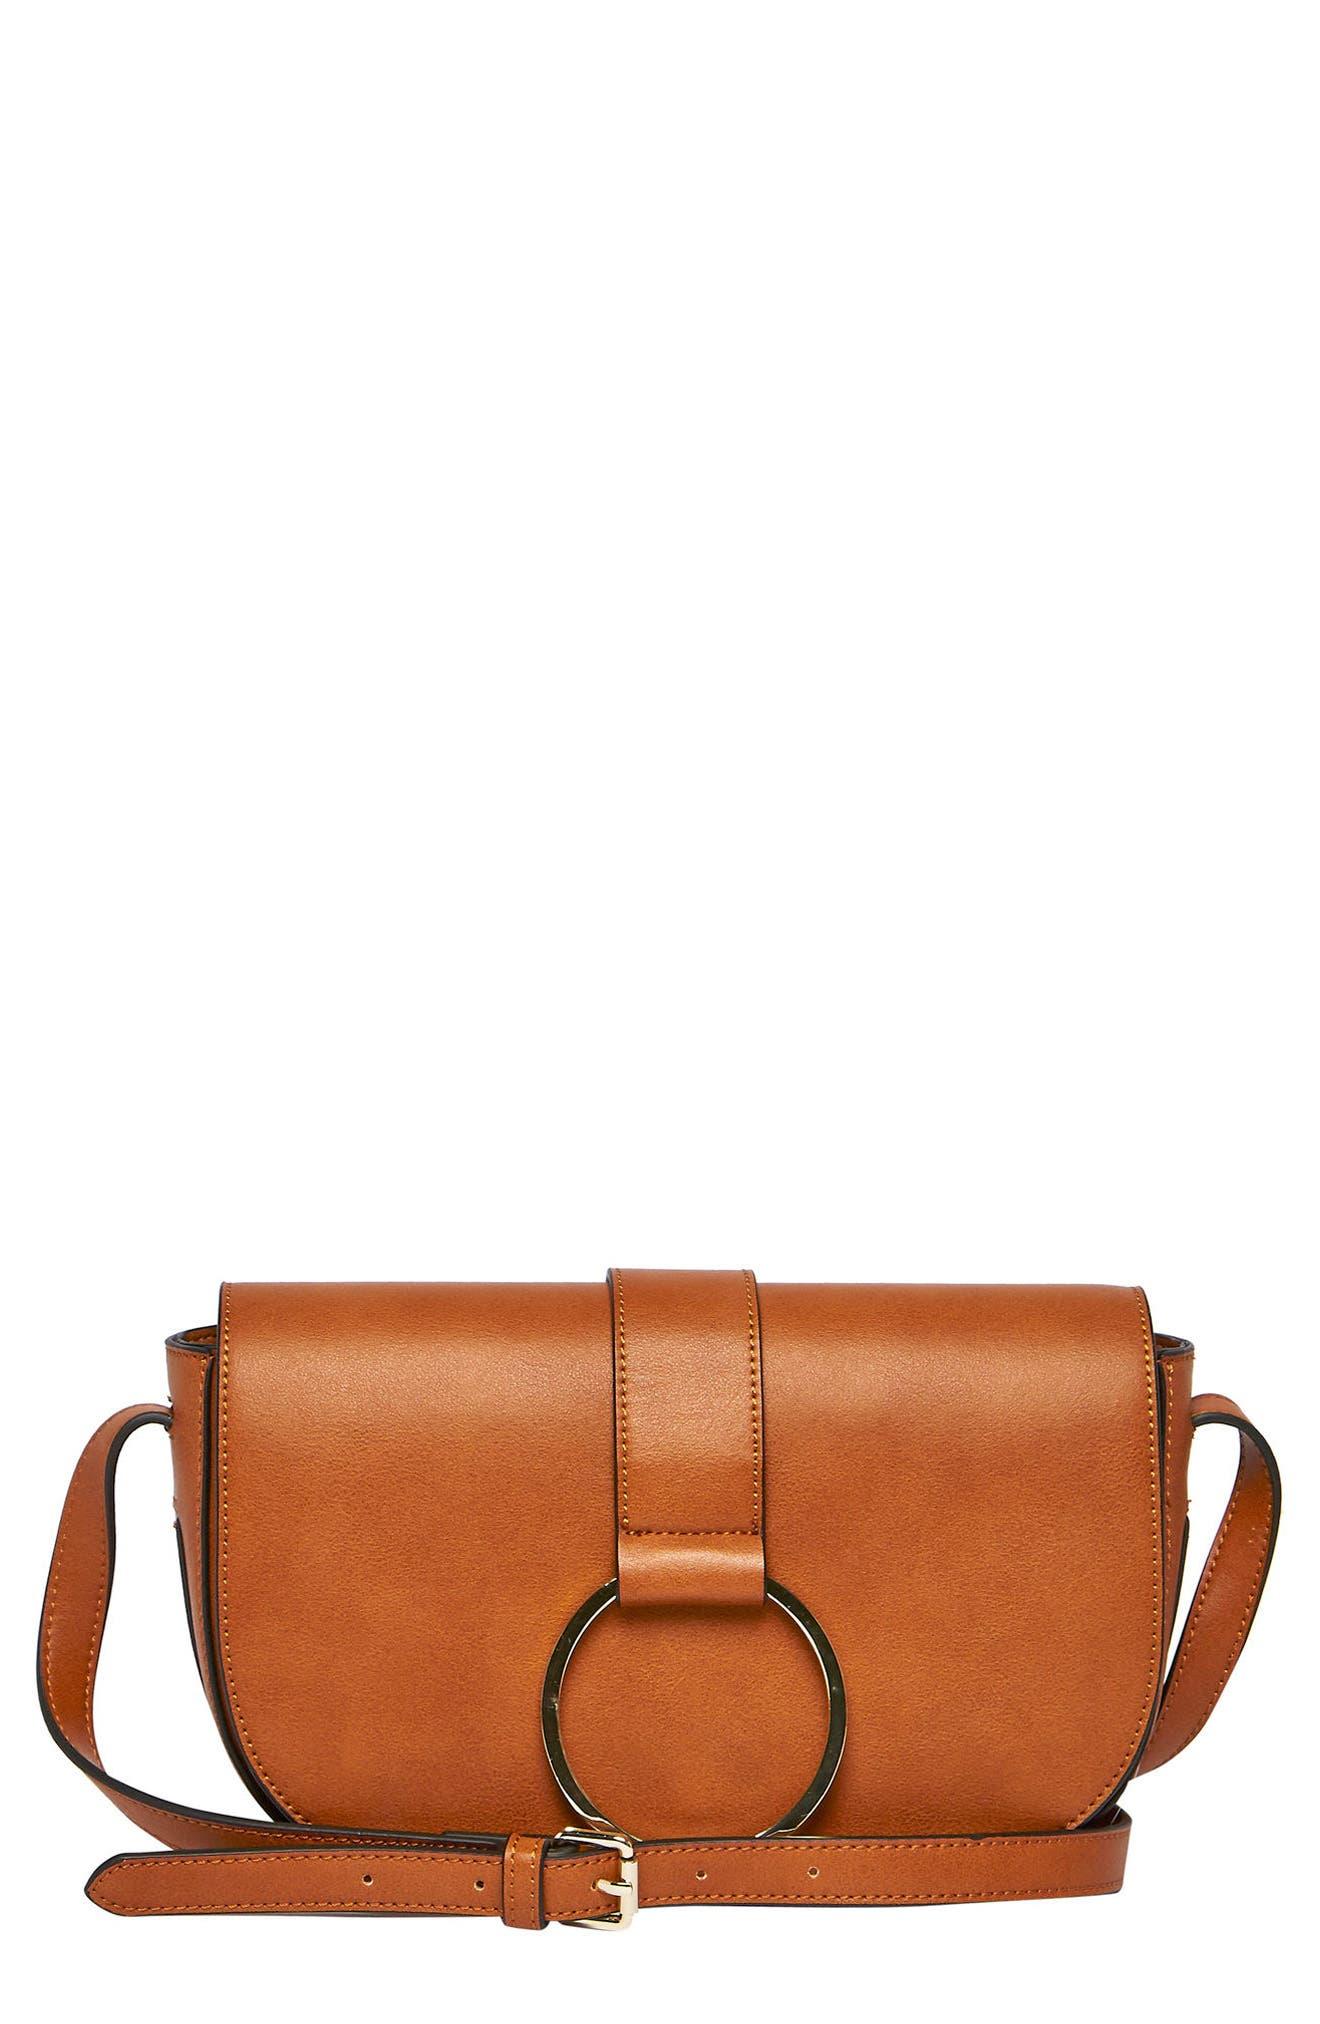 Lola Vegan Leather Crossbody Saddle Bag,                         Main,                         color, TAN